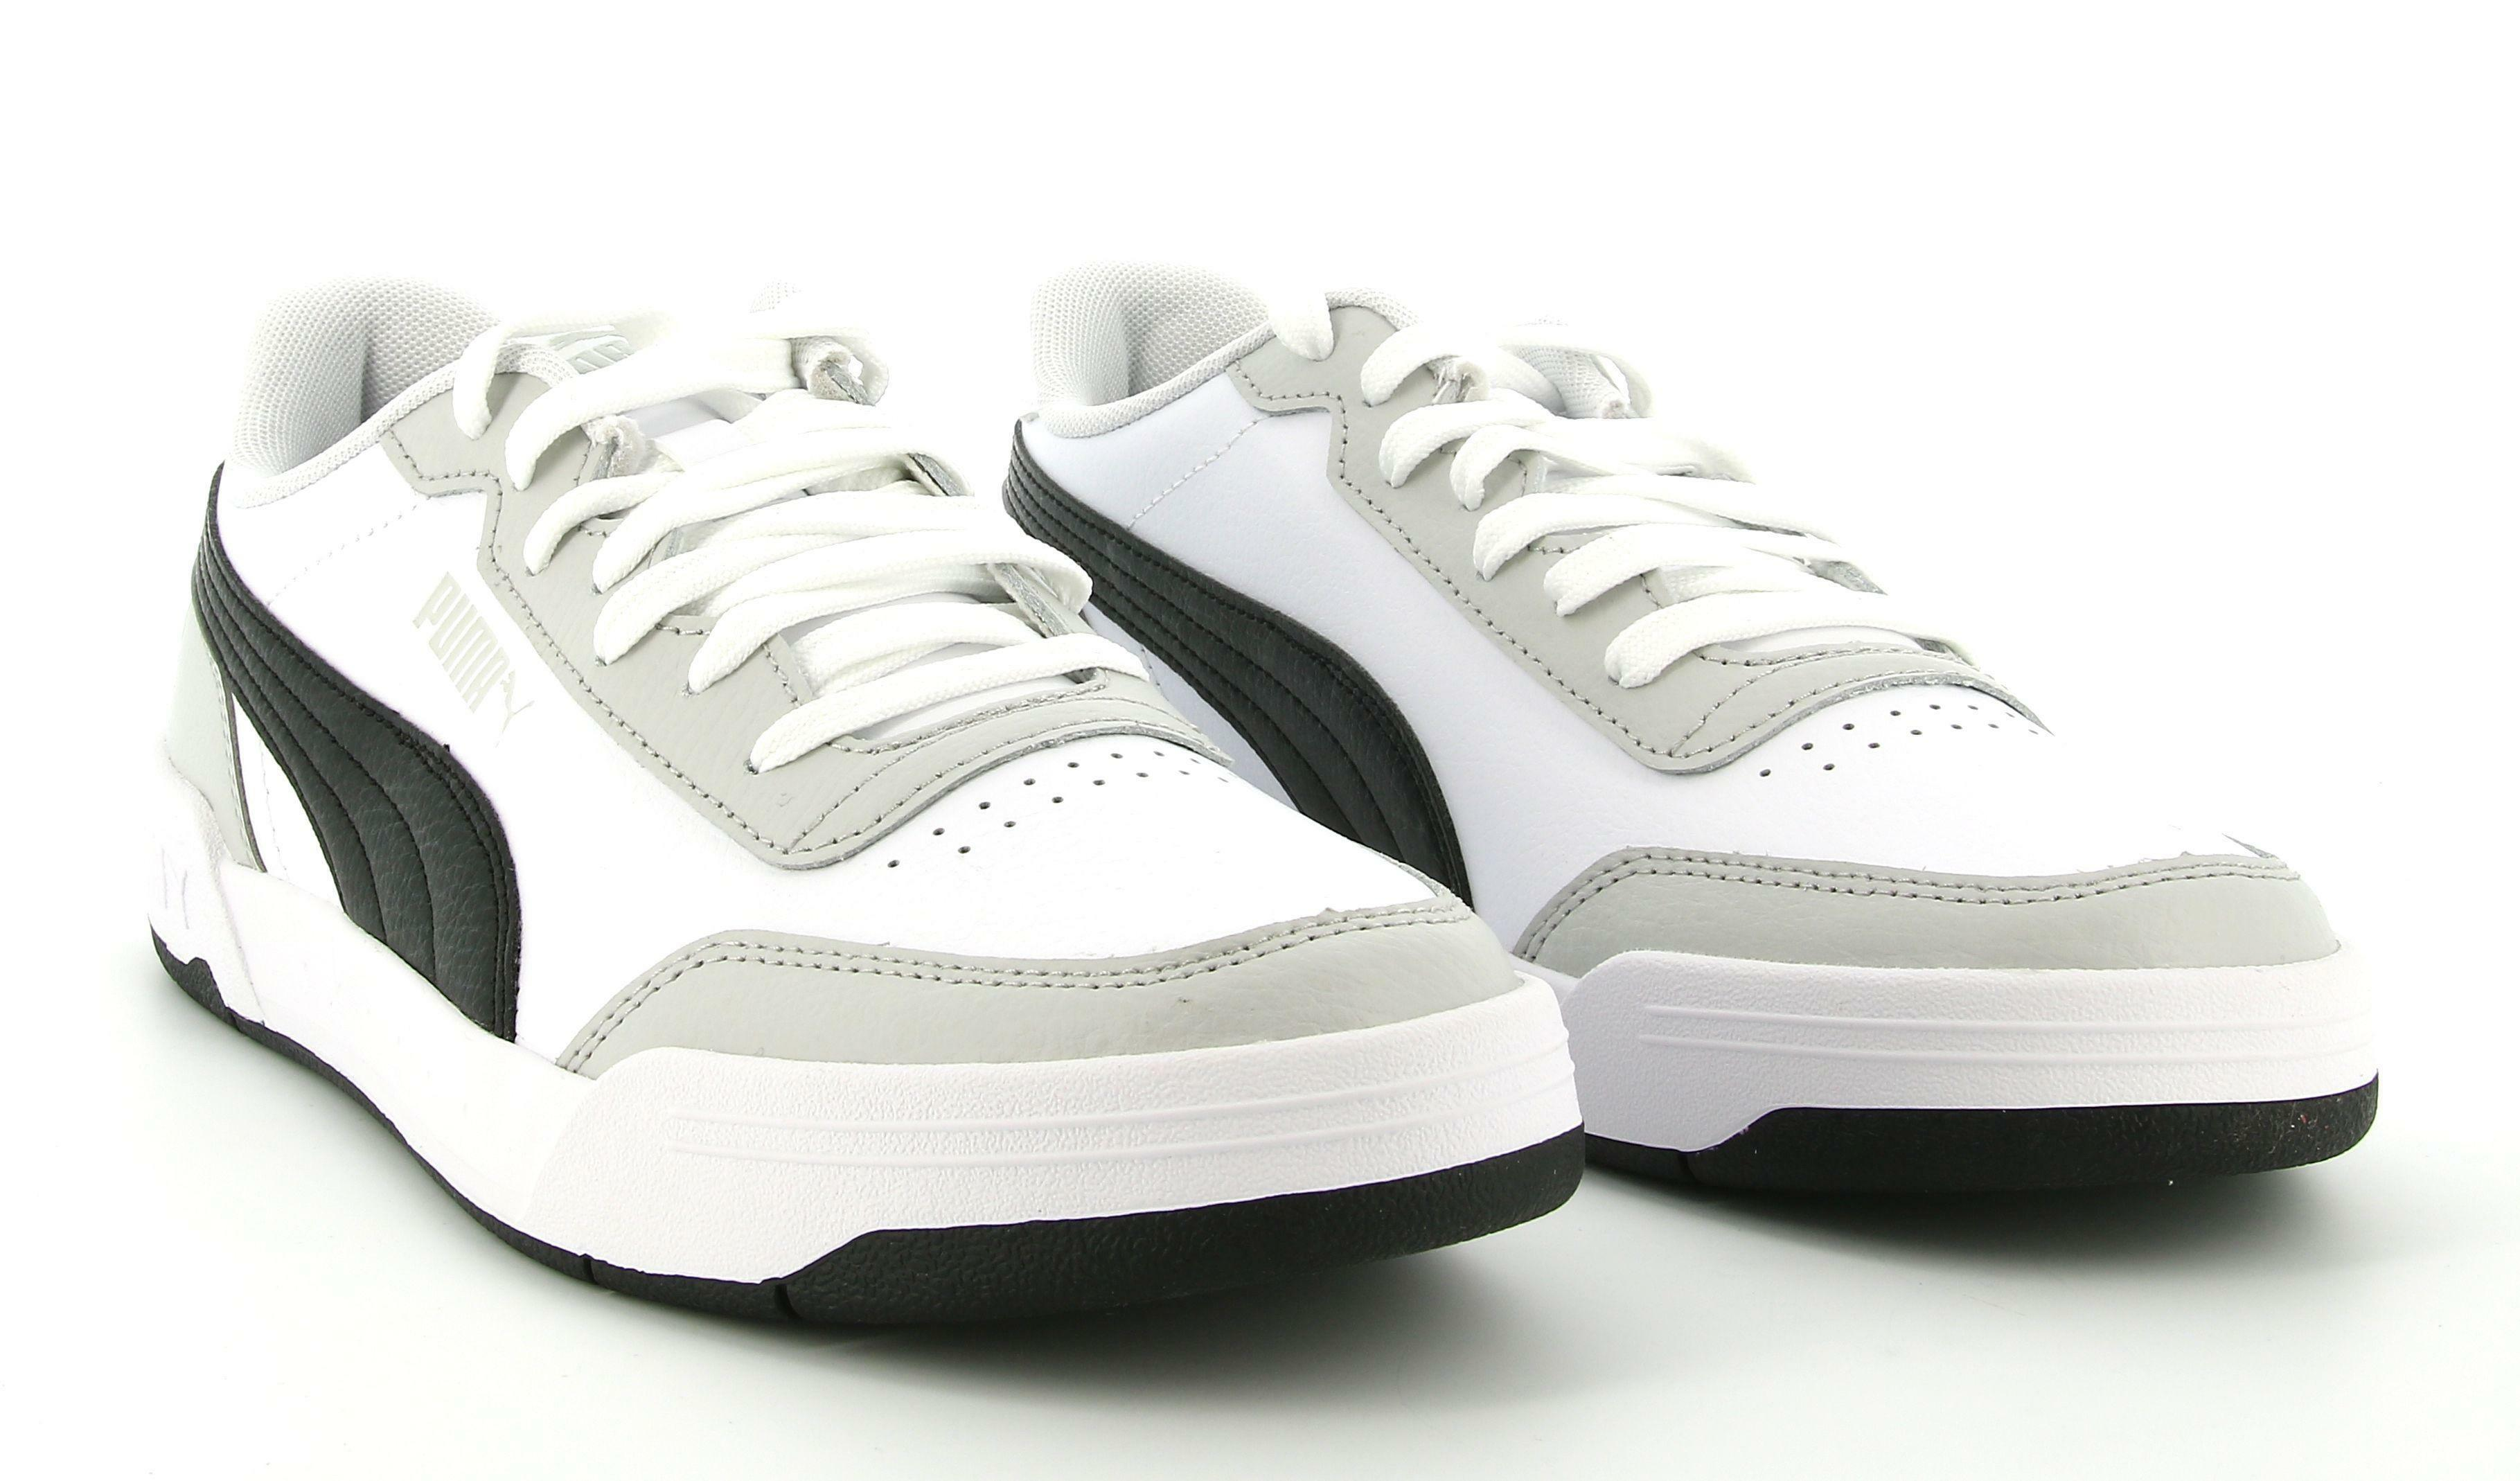 puma puma caracal 369863 023 sneaker bassa uomo bianca